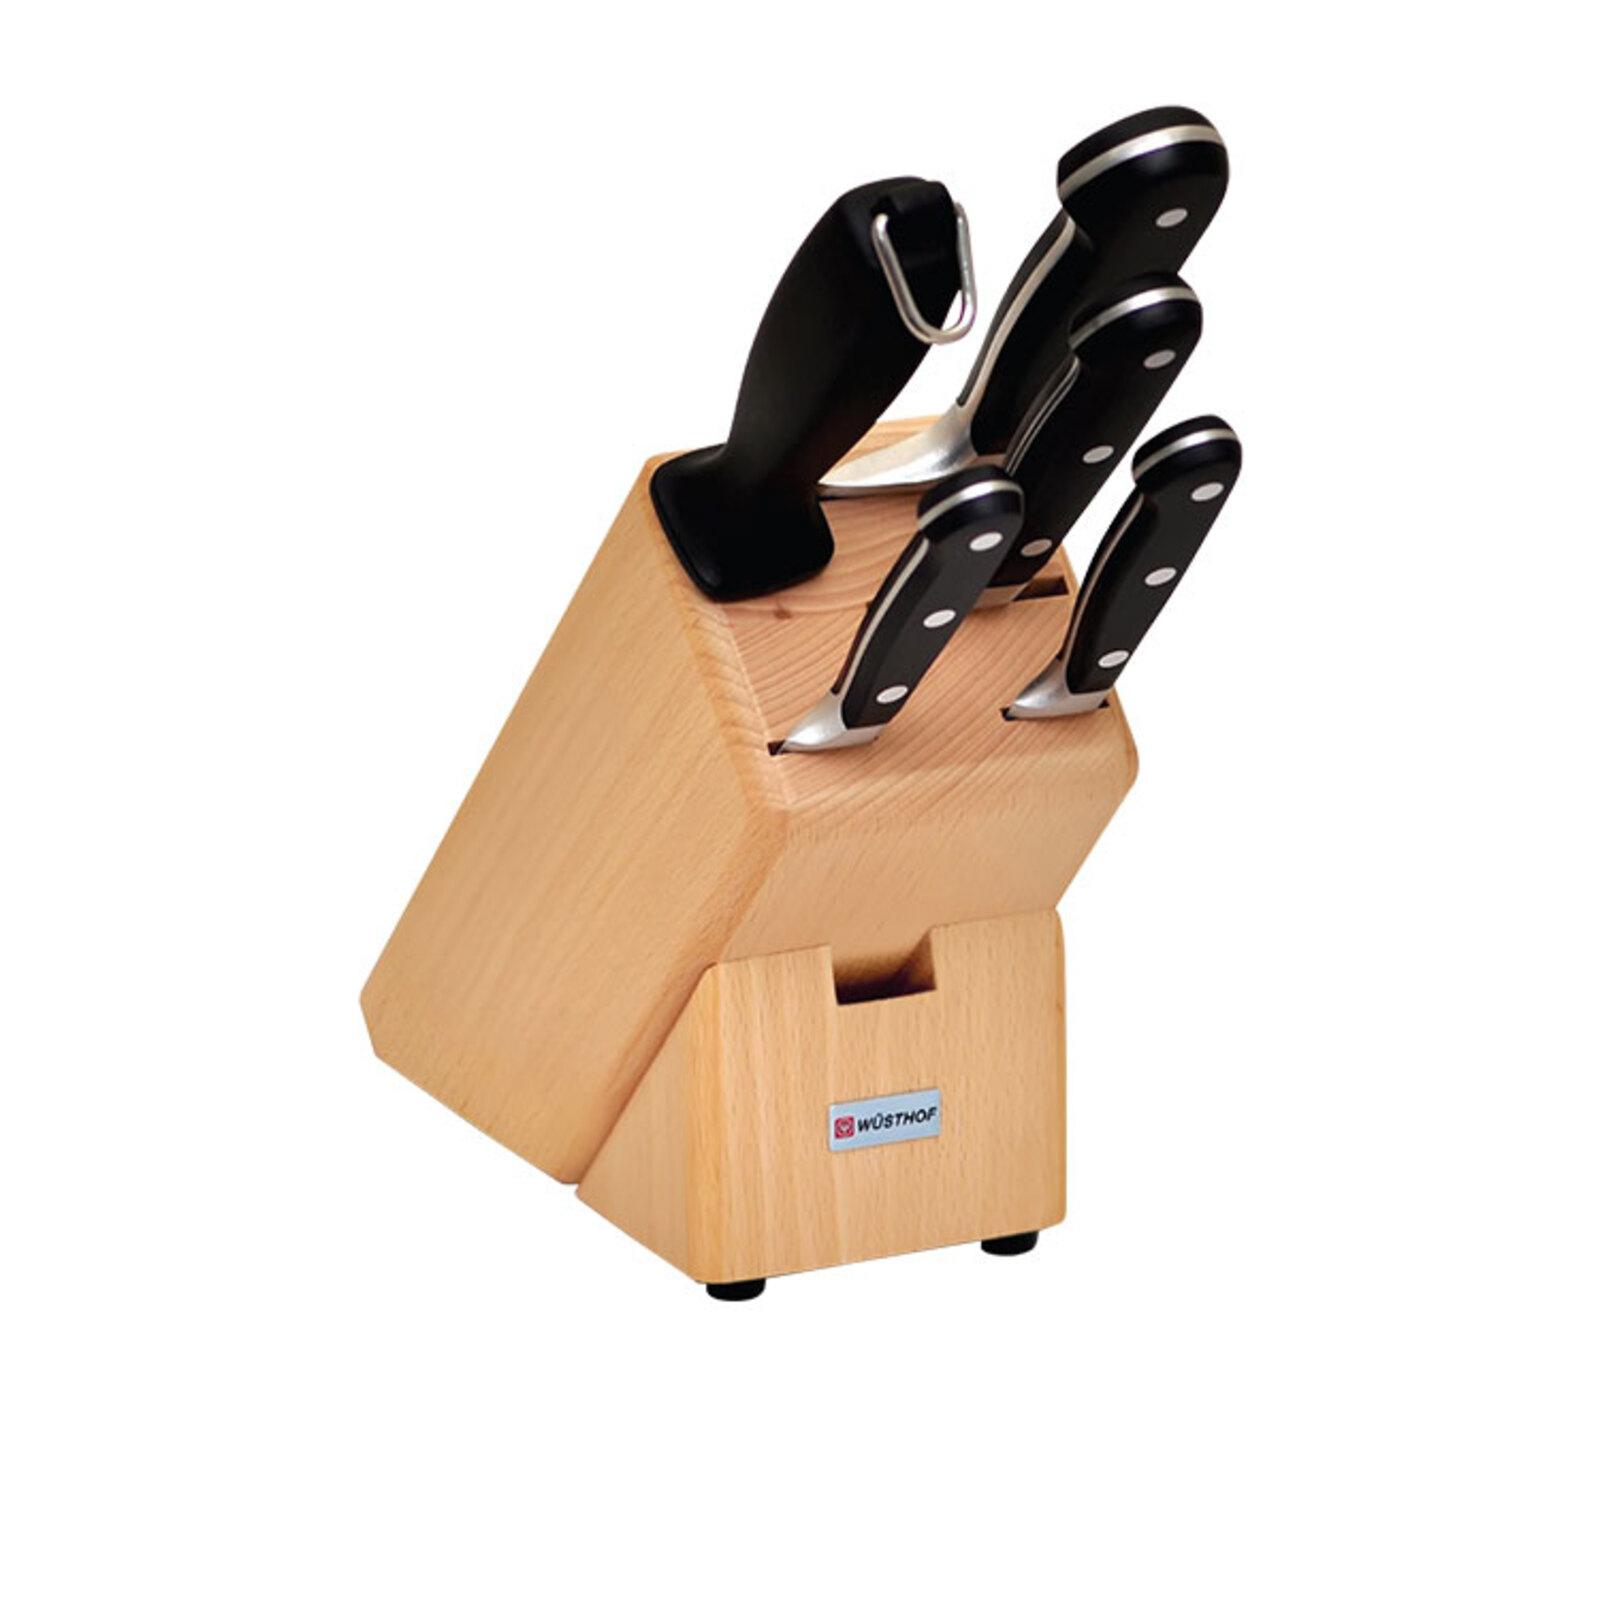 Wusthof Essential Classic 6pc Knife Block Set